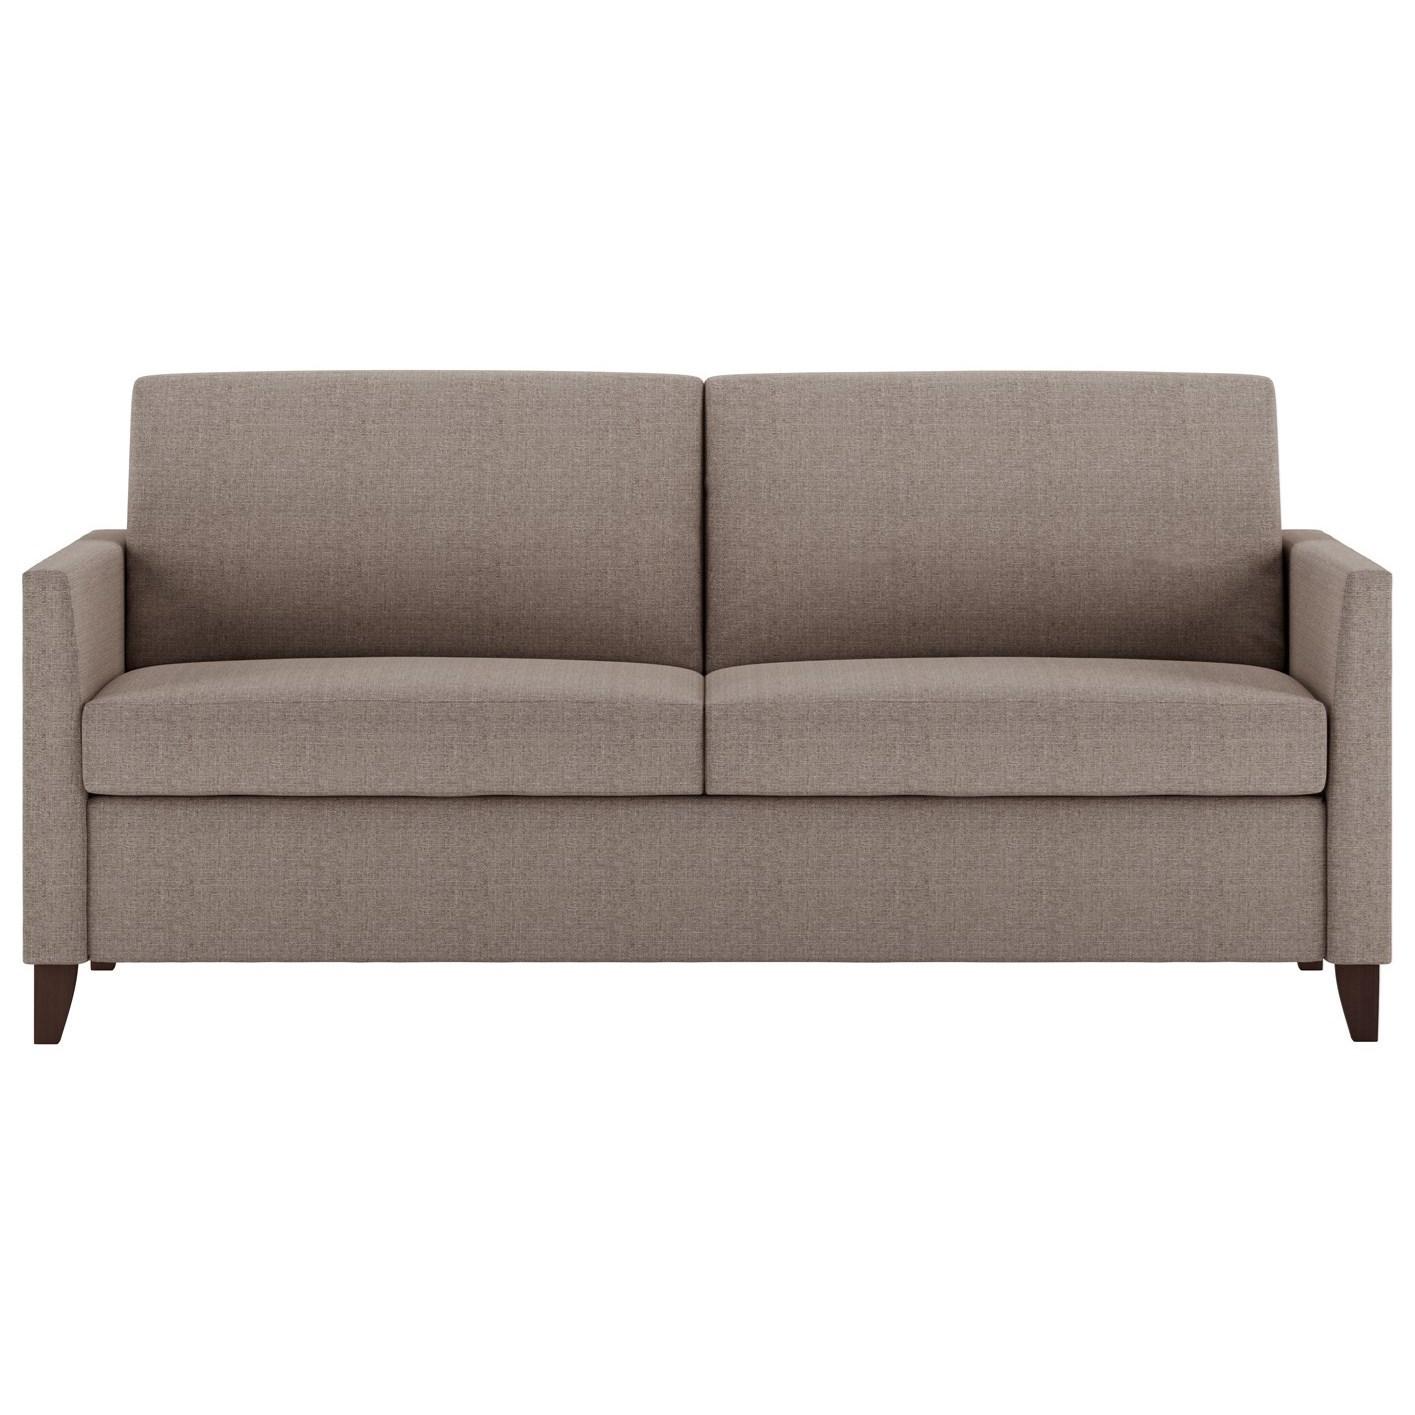 Merveilleux American Leather HarrisQueen Size Sleeper Sofa ...